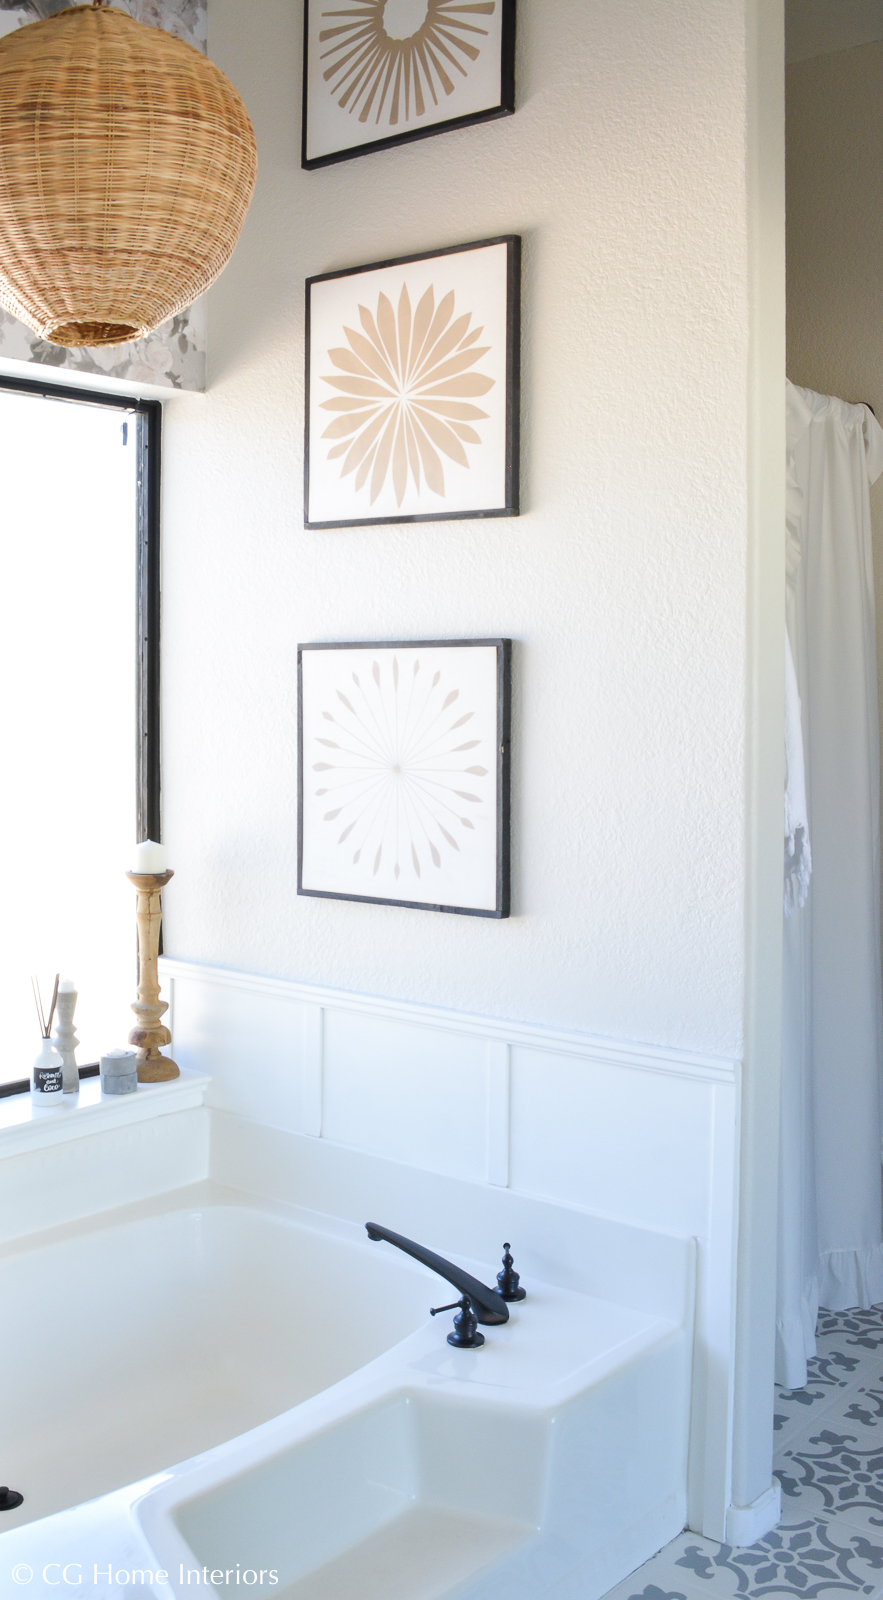 My Interior Paint Colors, Sherwin Williams, Windfresh White